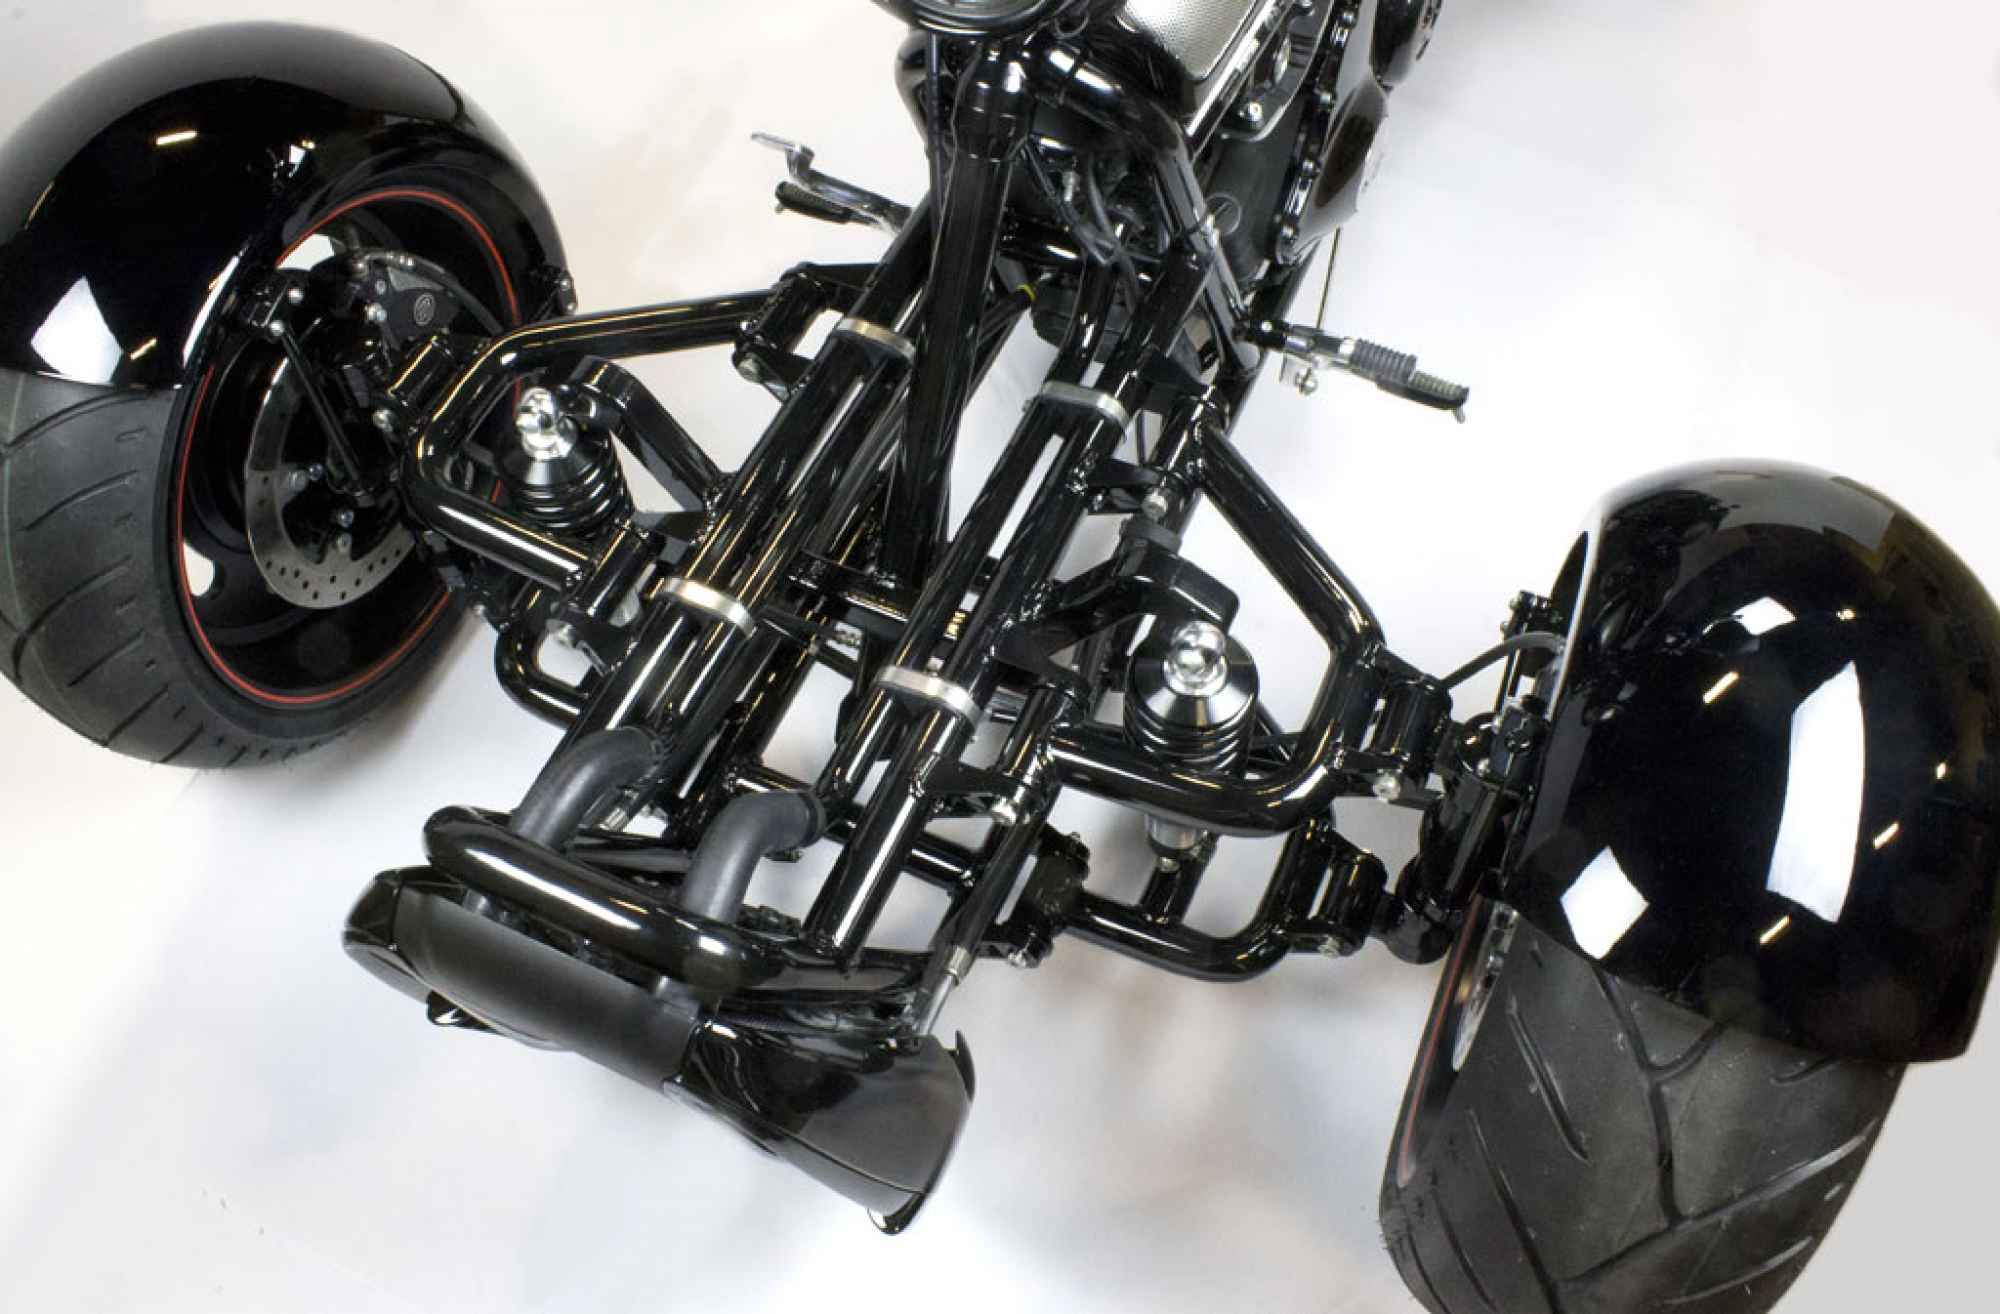 Custom Harley Davidson V Rod Scorpion Reverse Trike Wild File